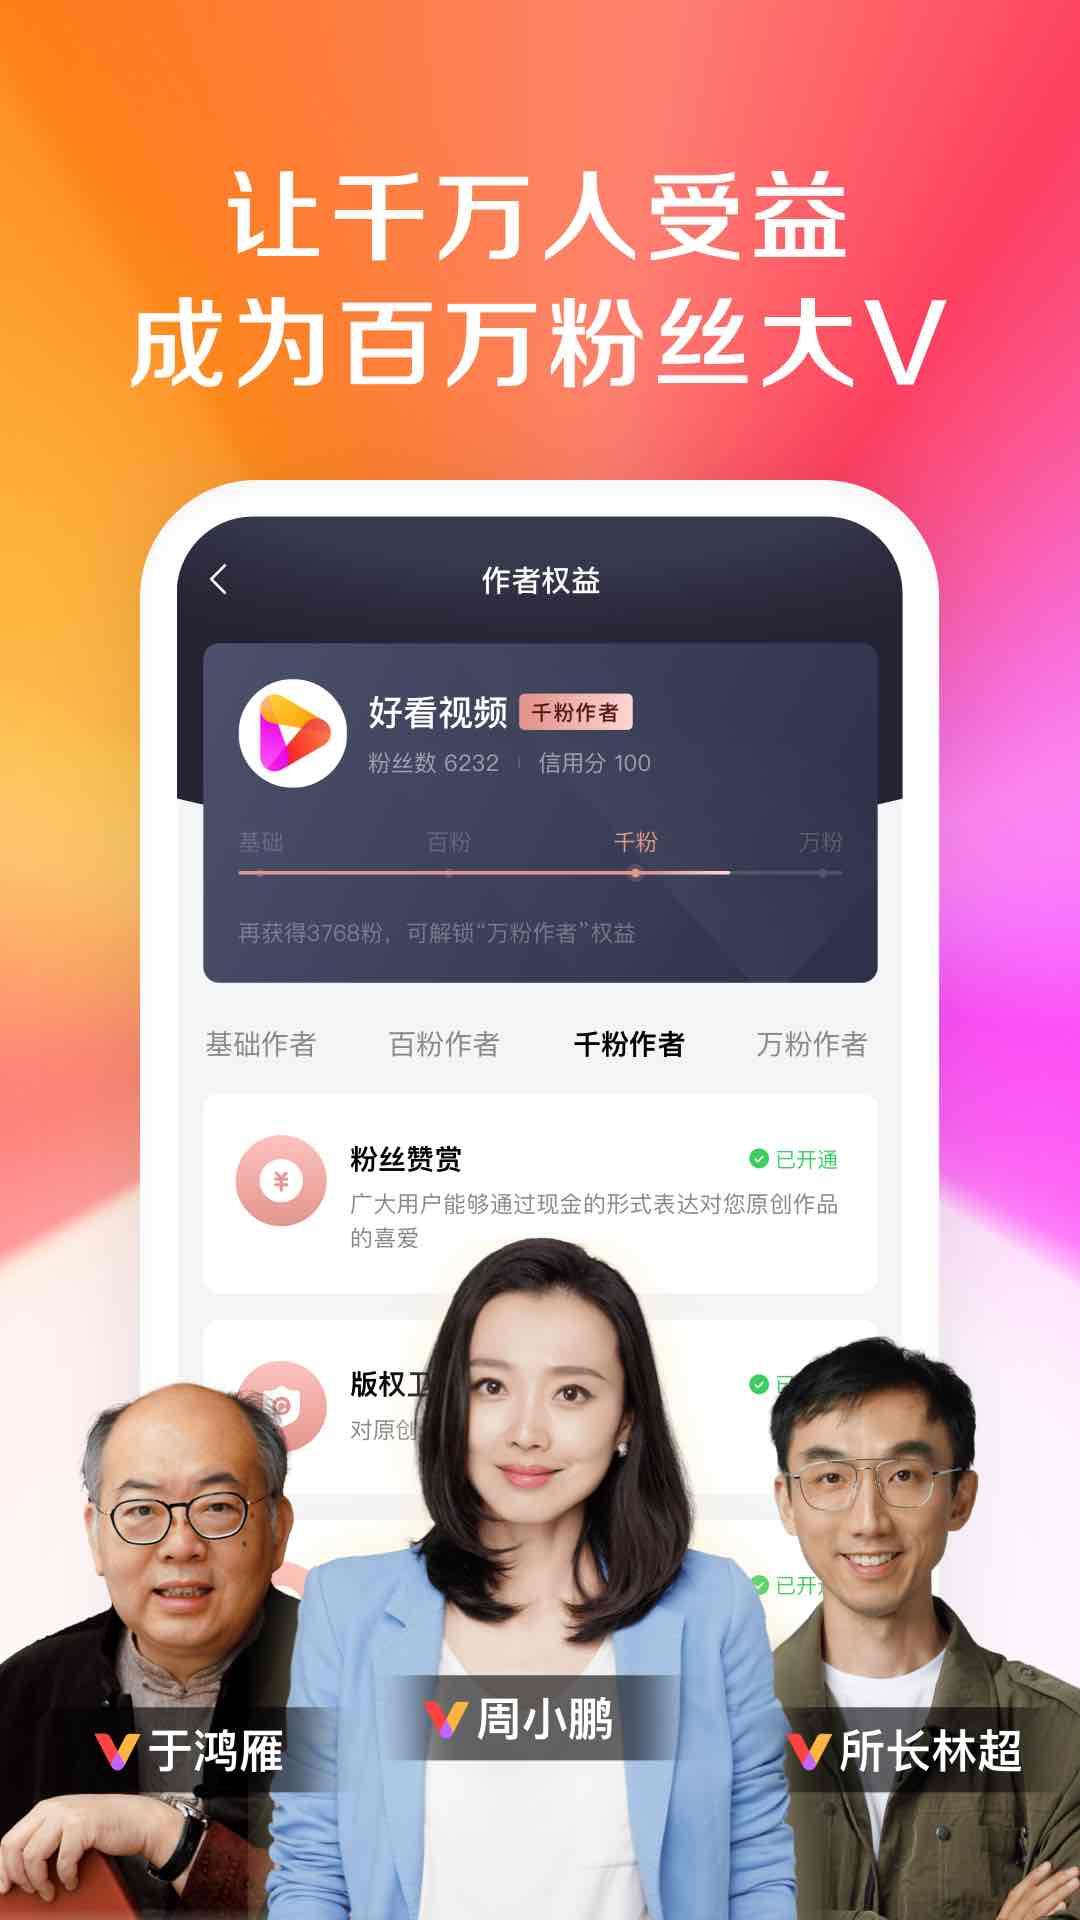 好看视频appv6.16.5.10 安卓版